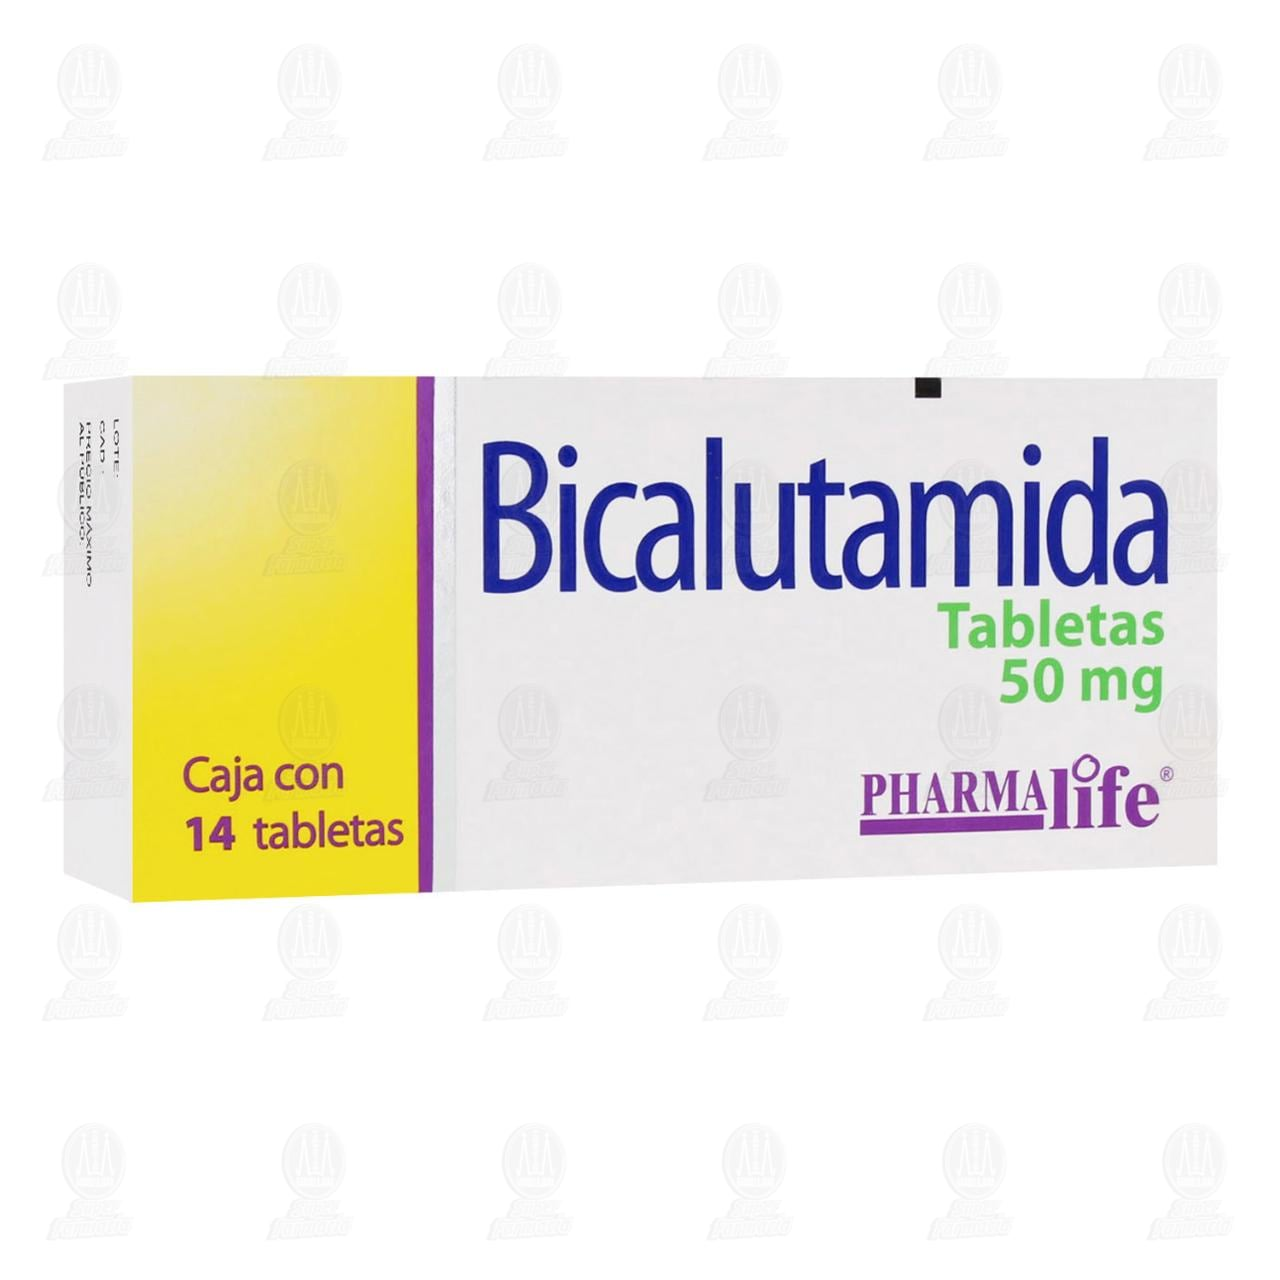 Comprar Bicalutamida 50mg 14 Tabletas Pharmalife en Farmacias Guadalajara